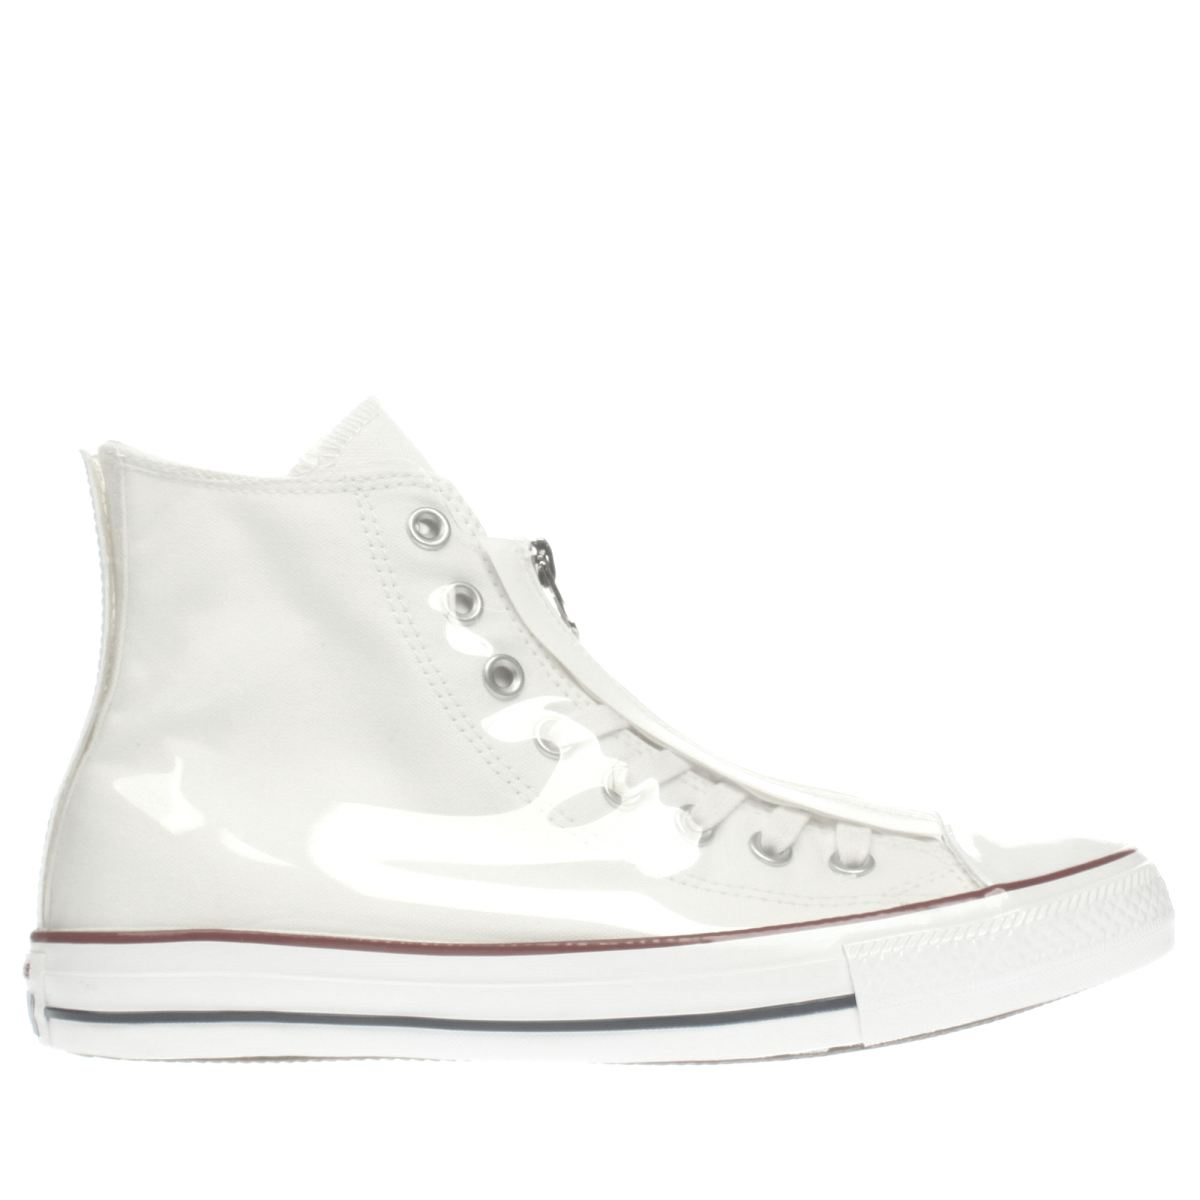 converse white shroud translucent hi trainers